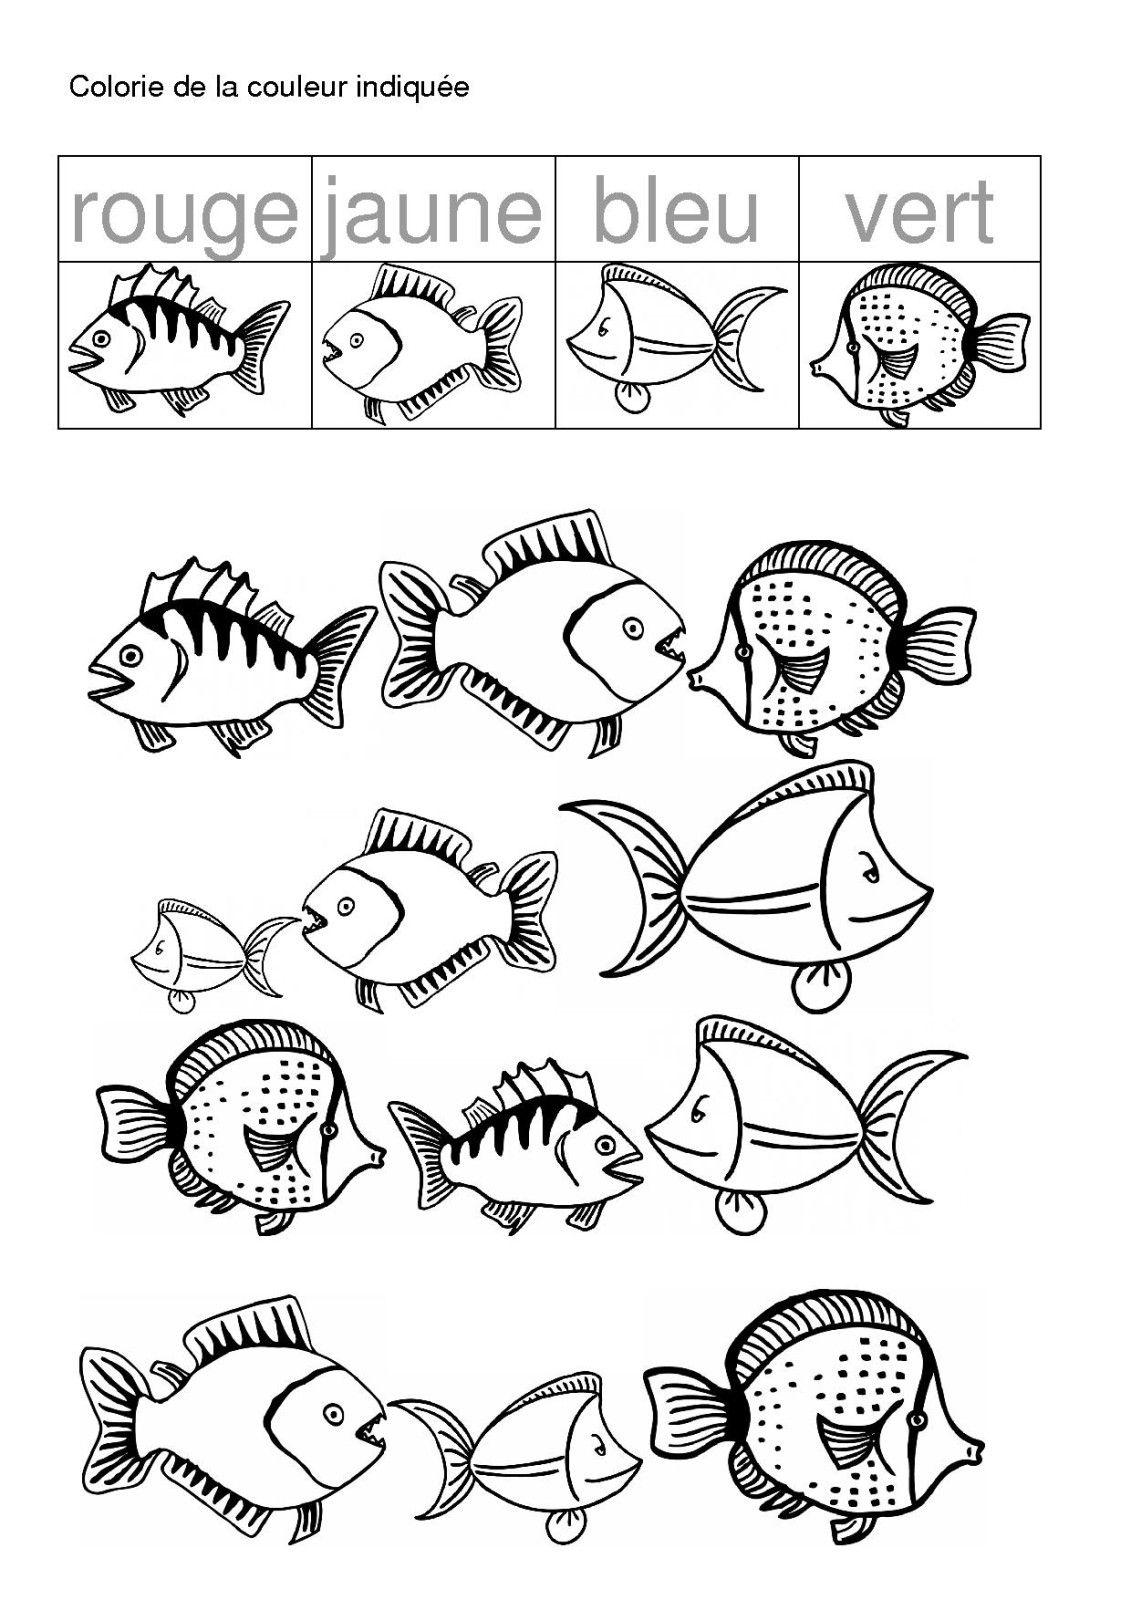 Poisson poissons fish activities rainbow fish activities et rainbow fish - Poisson avril maternelle ...